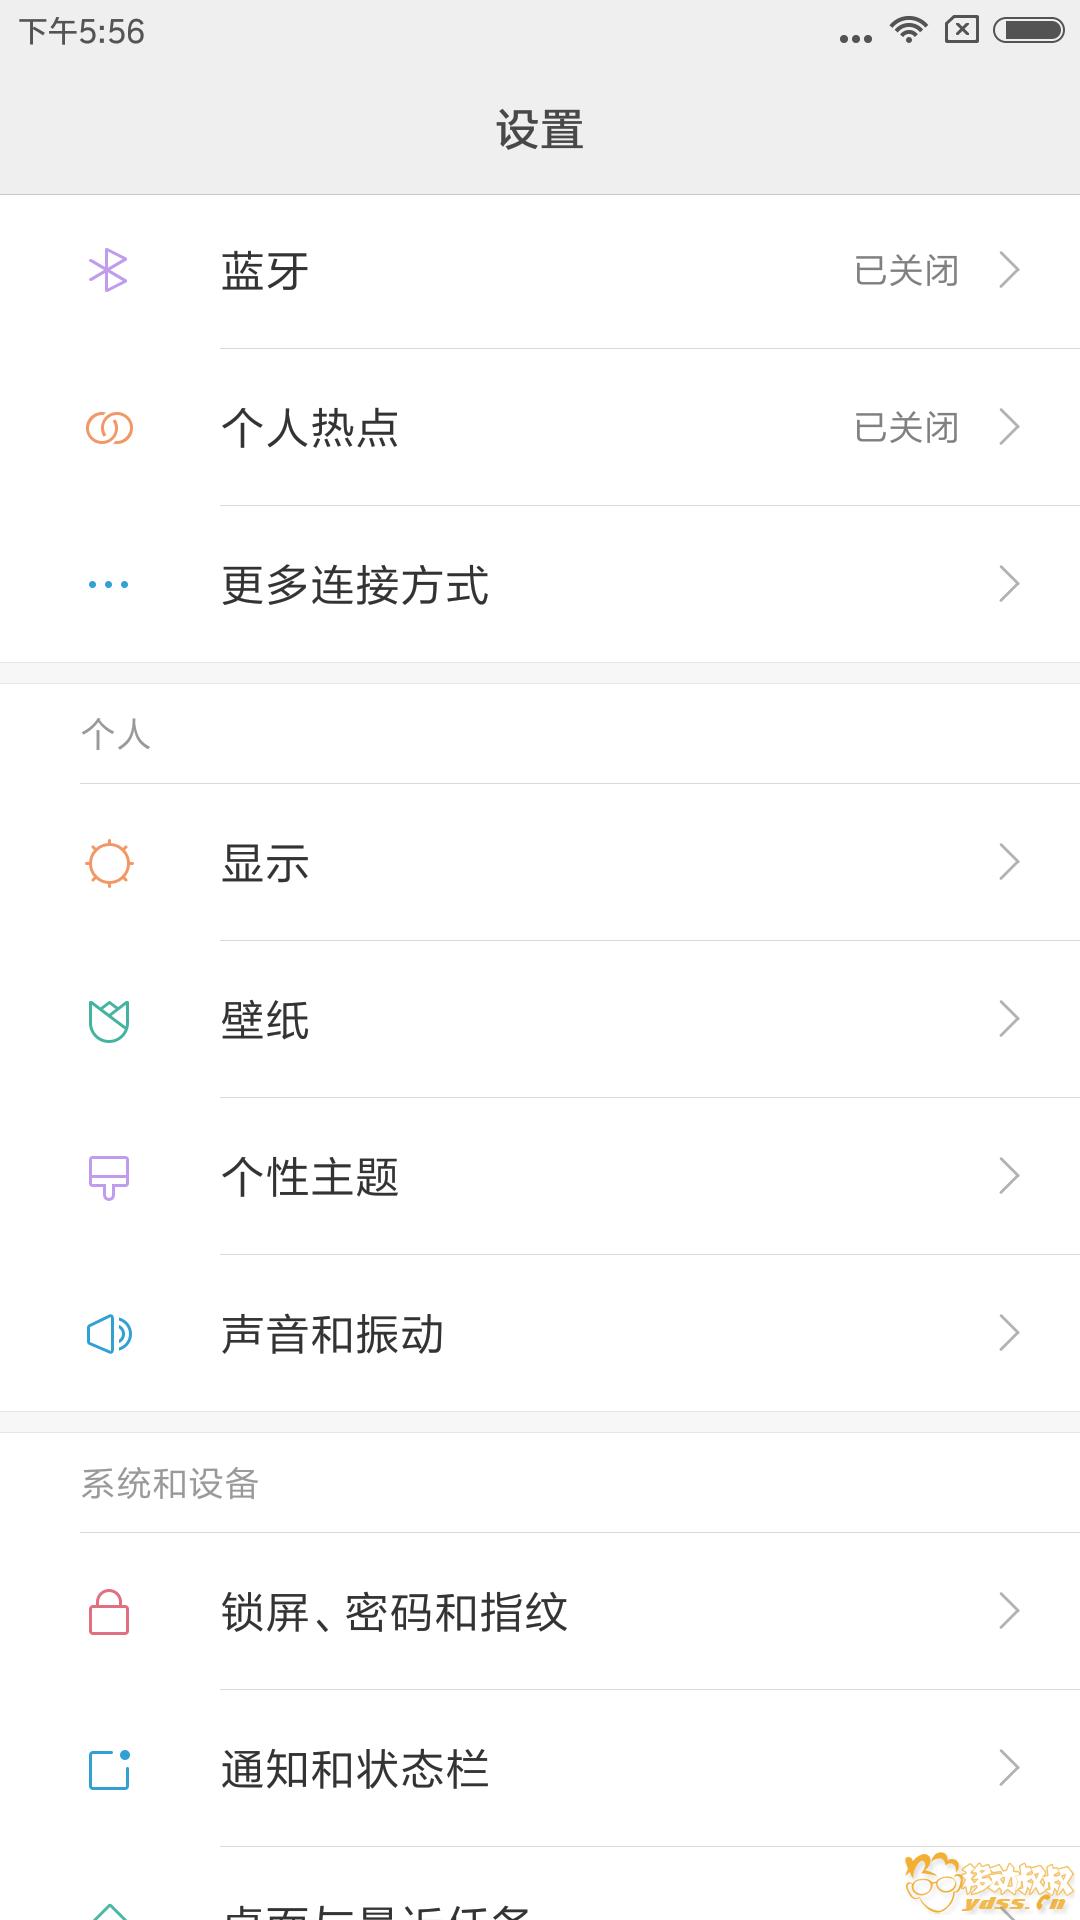 Screenshot_2017-10-24-17-56-46-630_com.android.settings.png